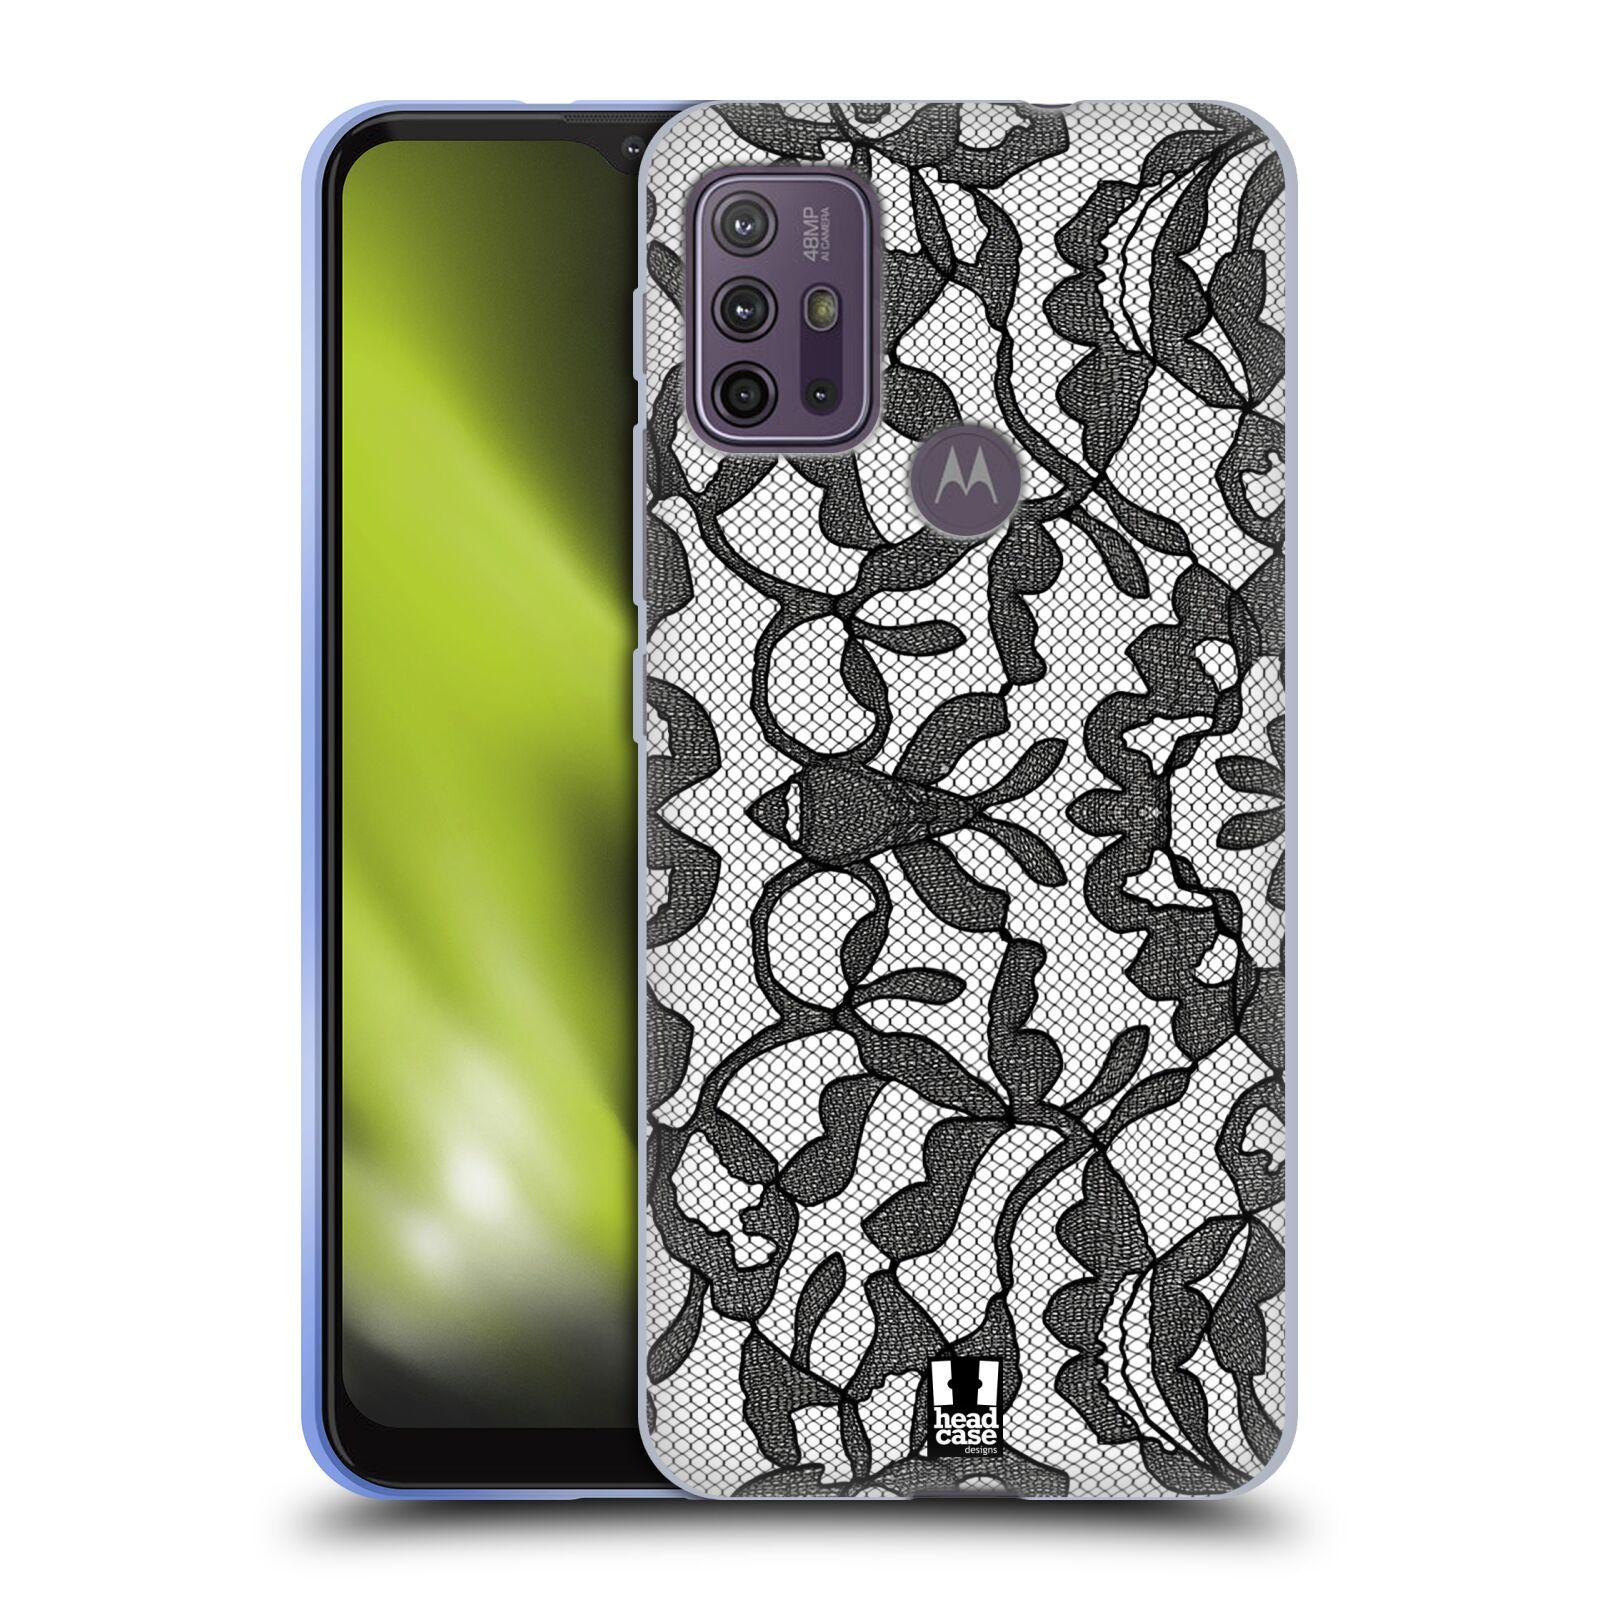 Silikonové pouzdro na mobil Motorola Moto G10 / G30 - Head Case - LEAFY KRAJKA